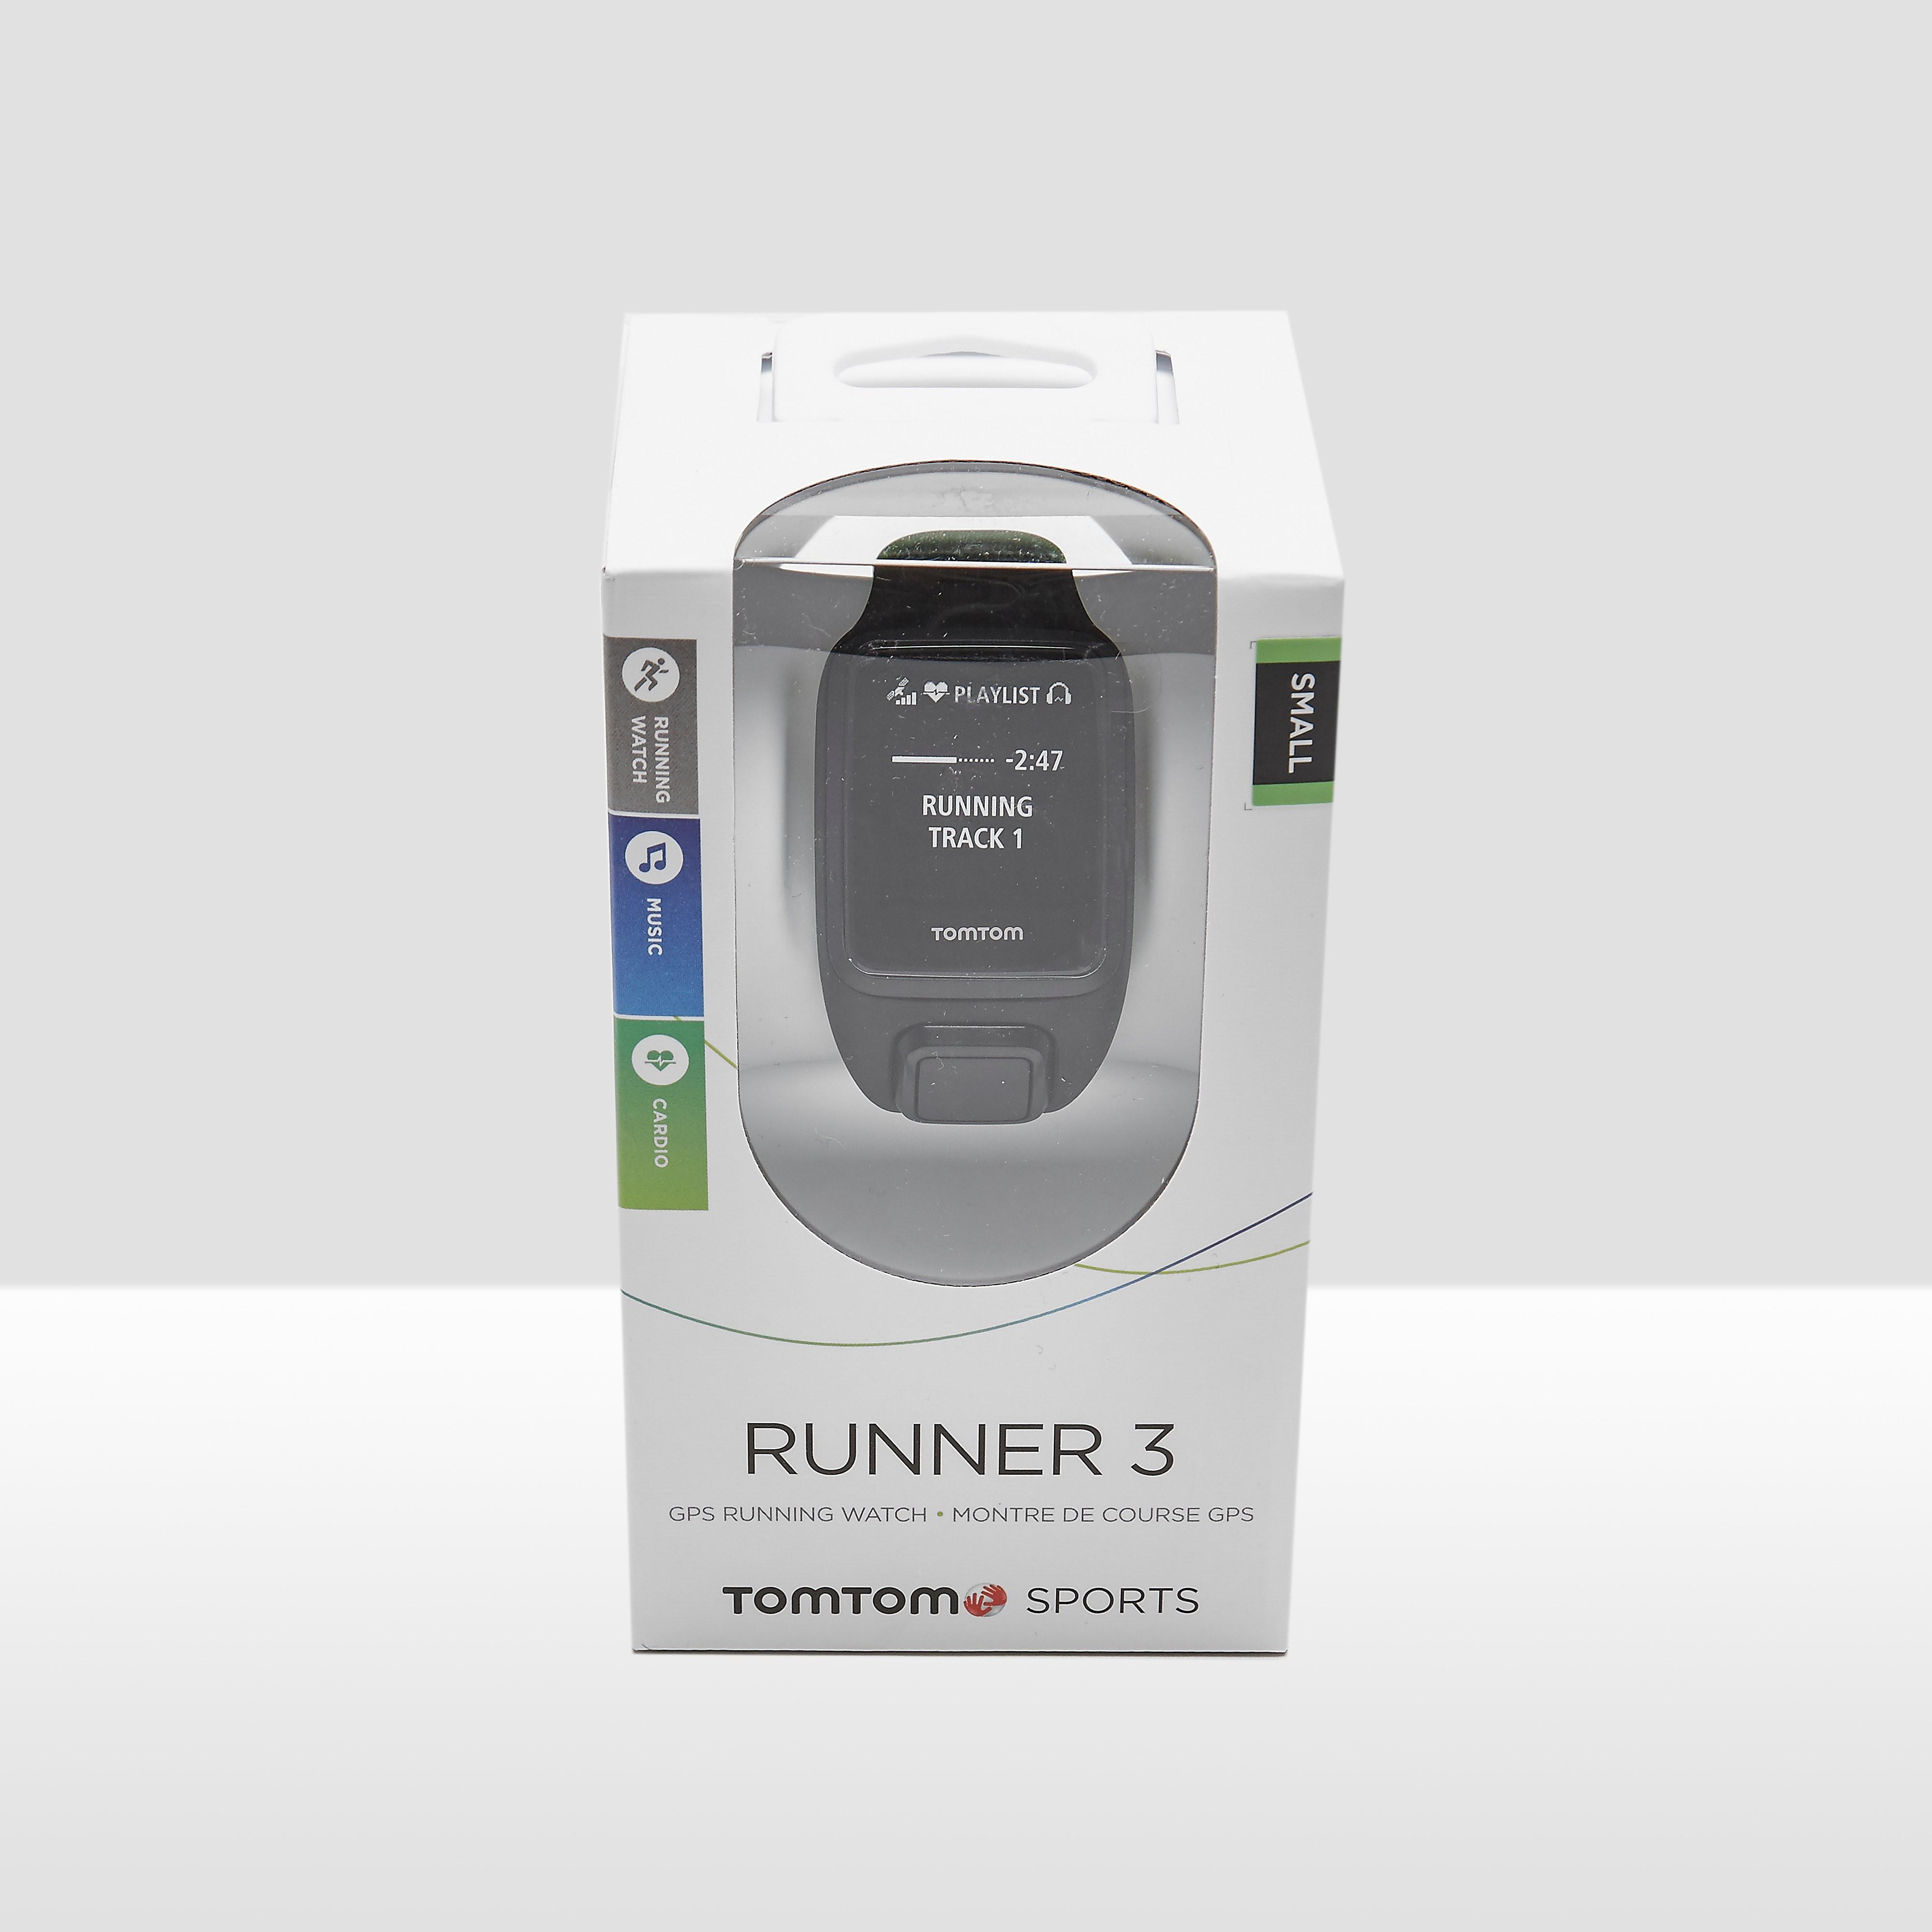 TOMTOM R3 CARDIO+MUSIC+GPS SMALL